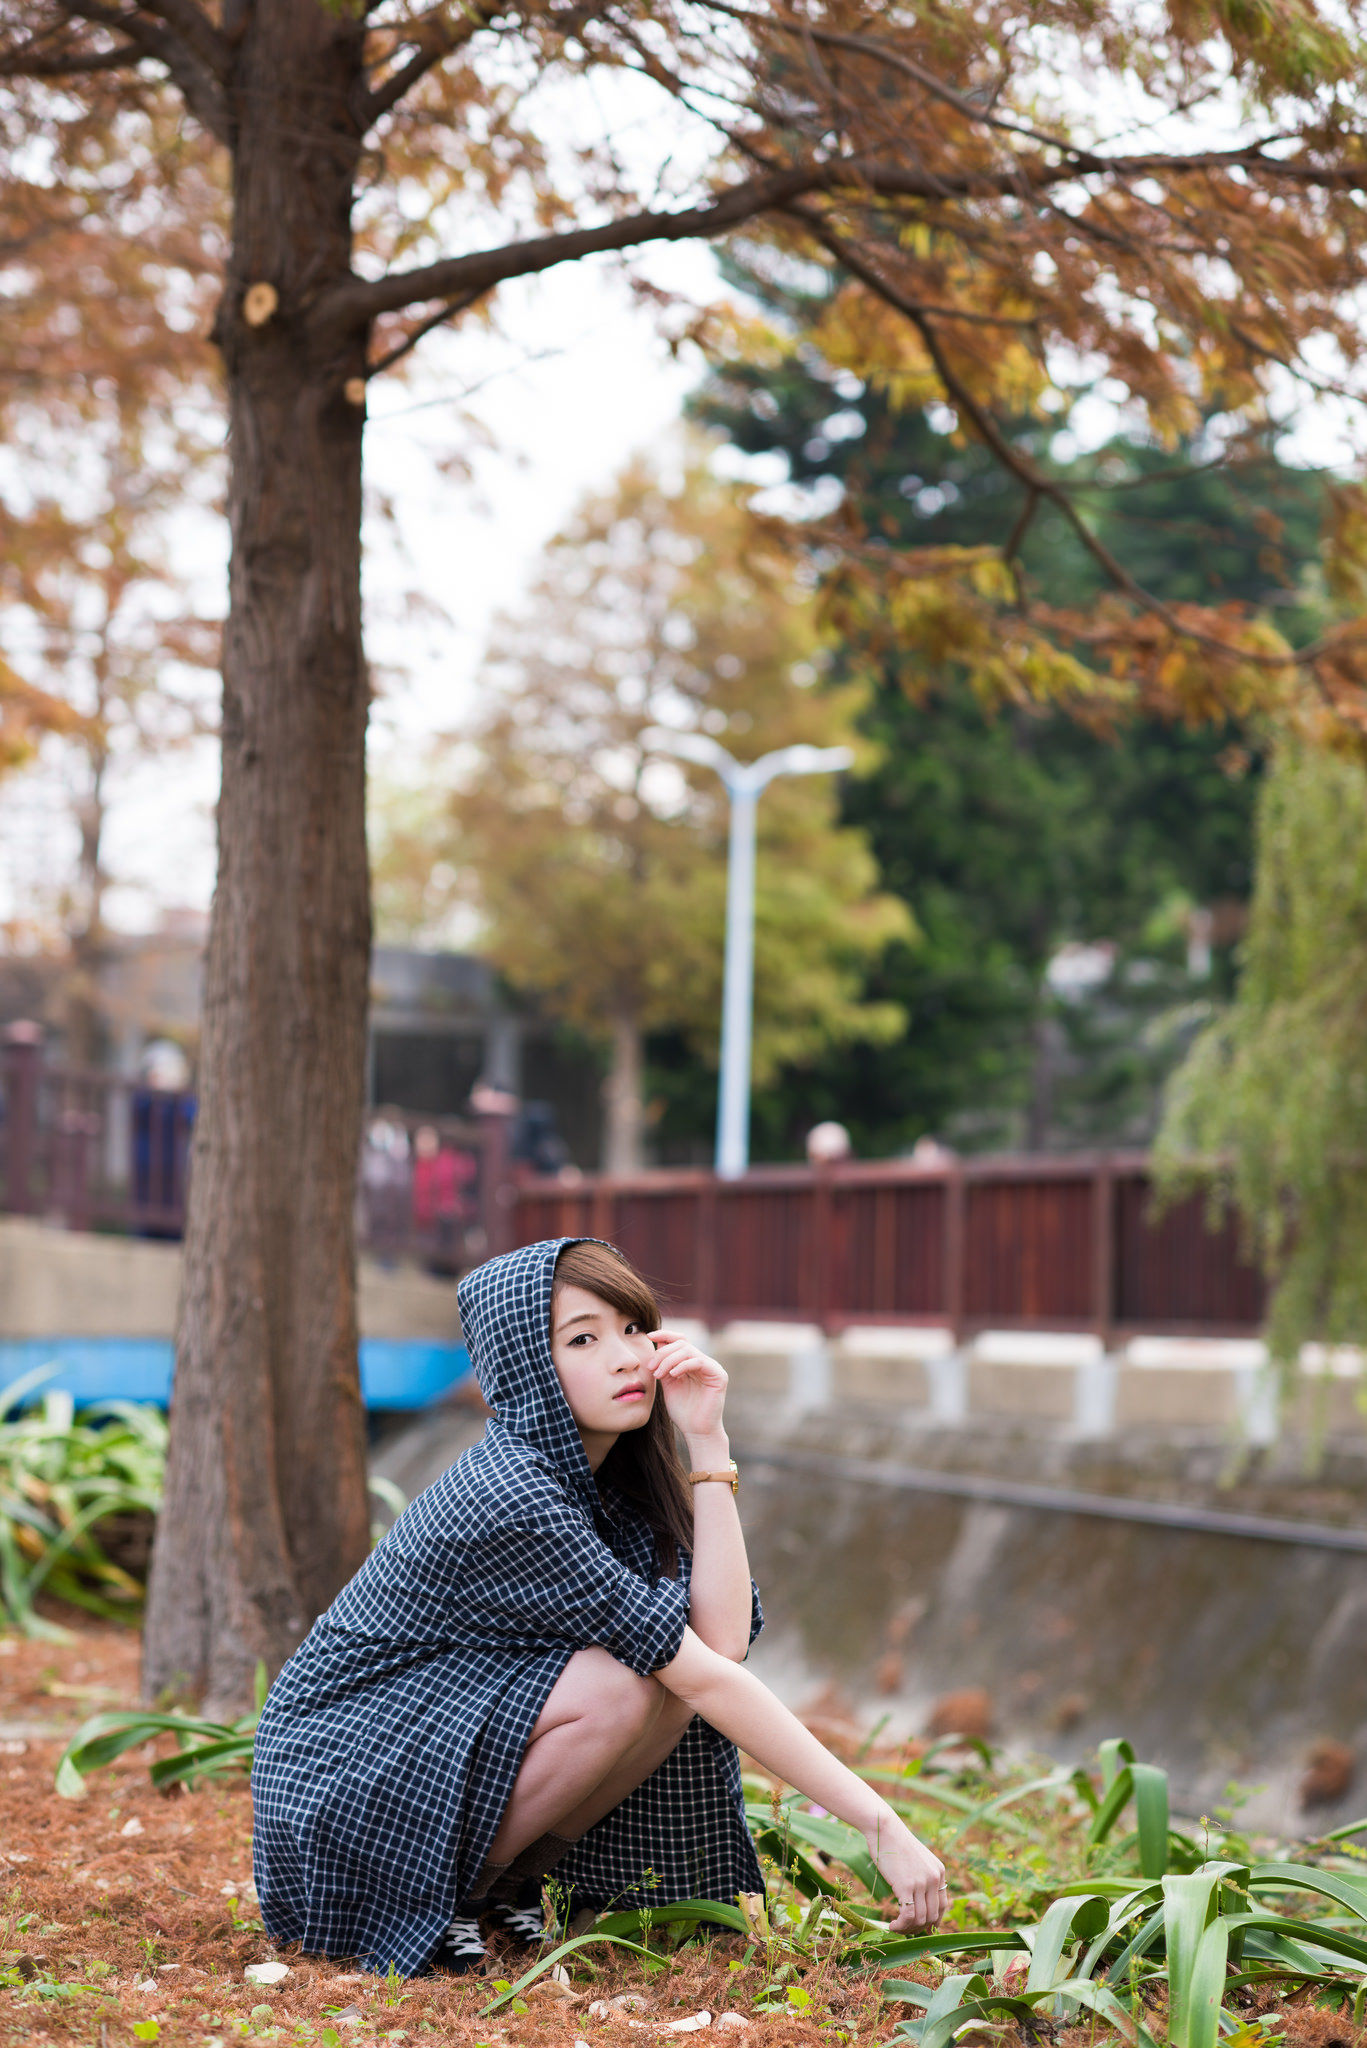 VOL.1366 [台湾正妹]清纯甜美唯美软妹:孙佳歆超高清个人性感漂亮大图(22P)